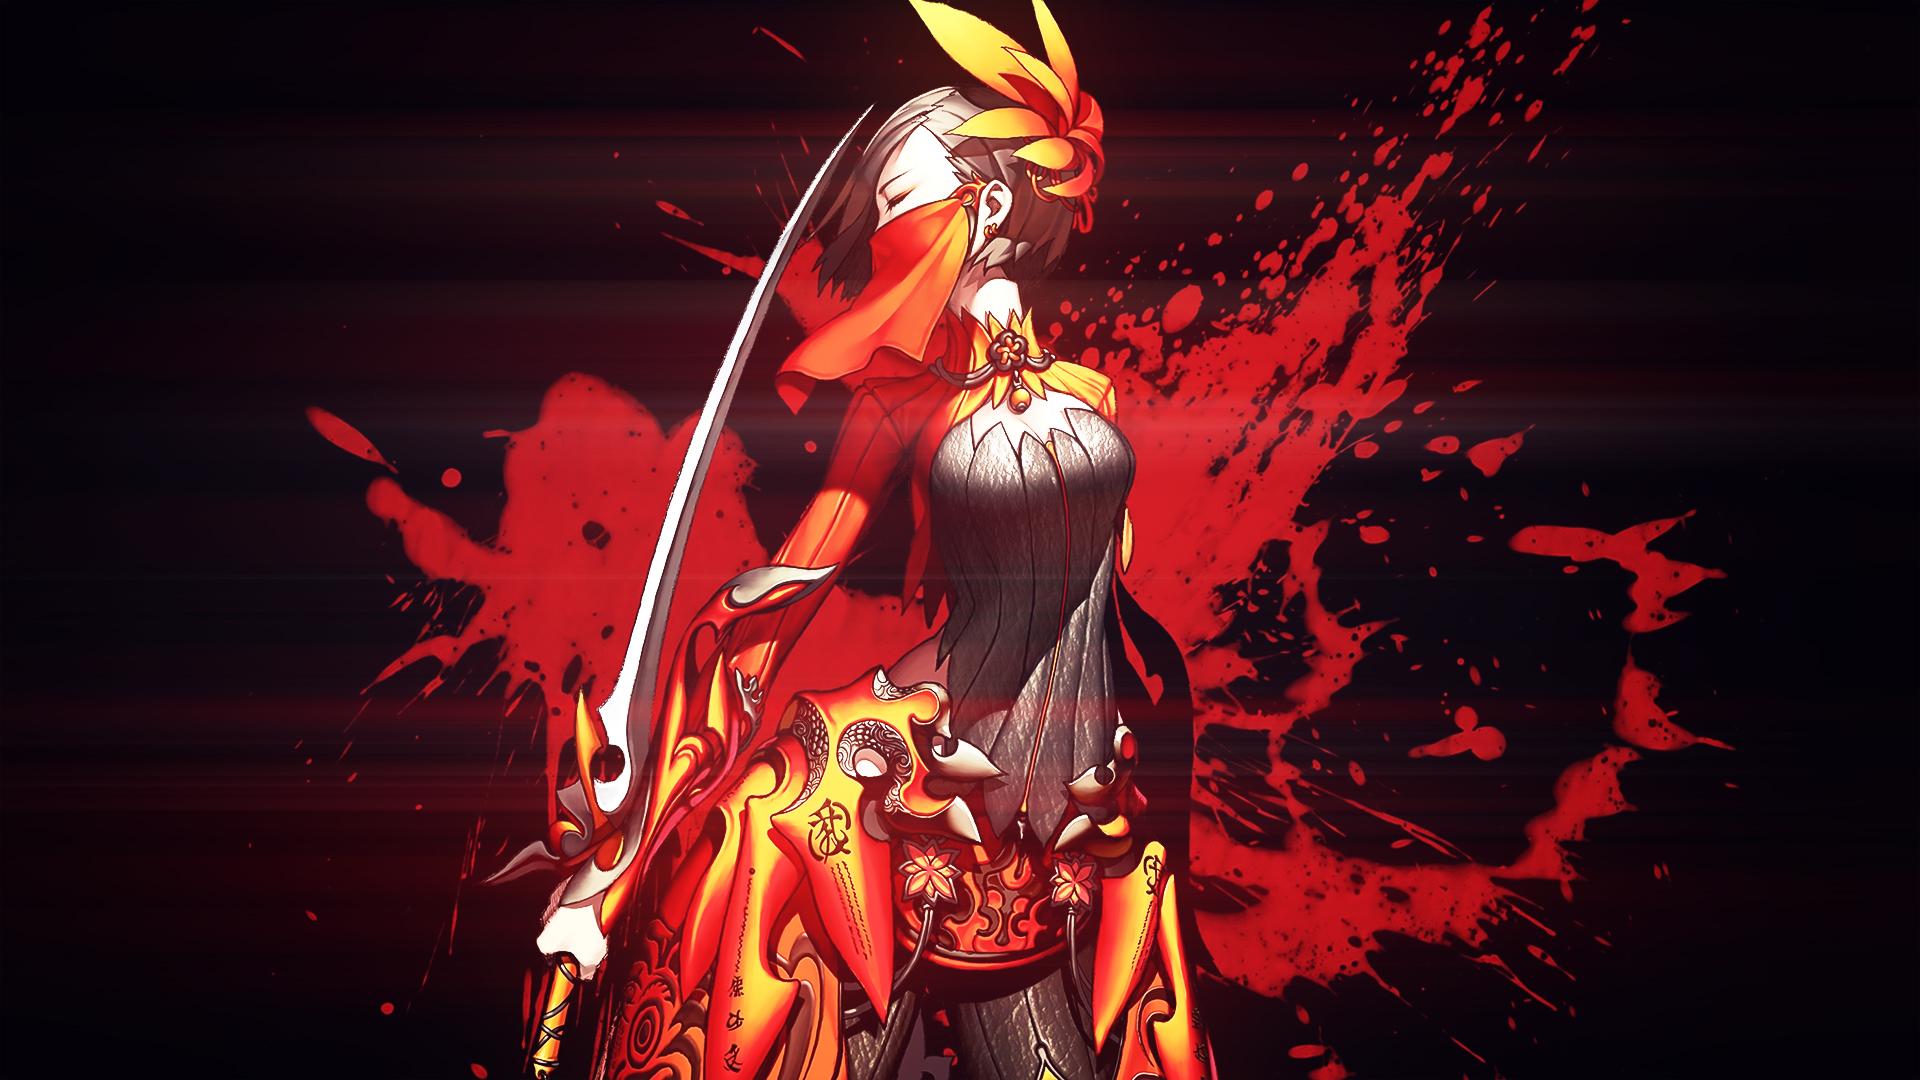 Blade And Soul Wallpaper: Blade And Soul Wallpaper By Kampinis On DeviantArt